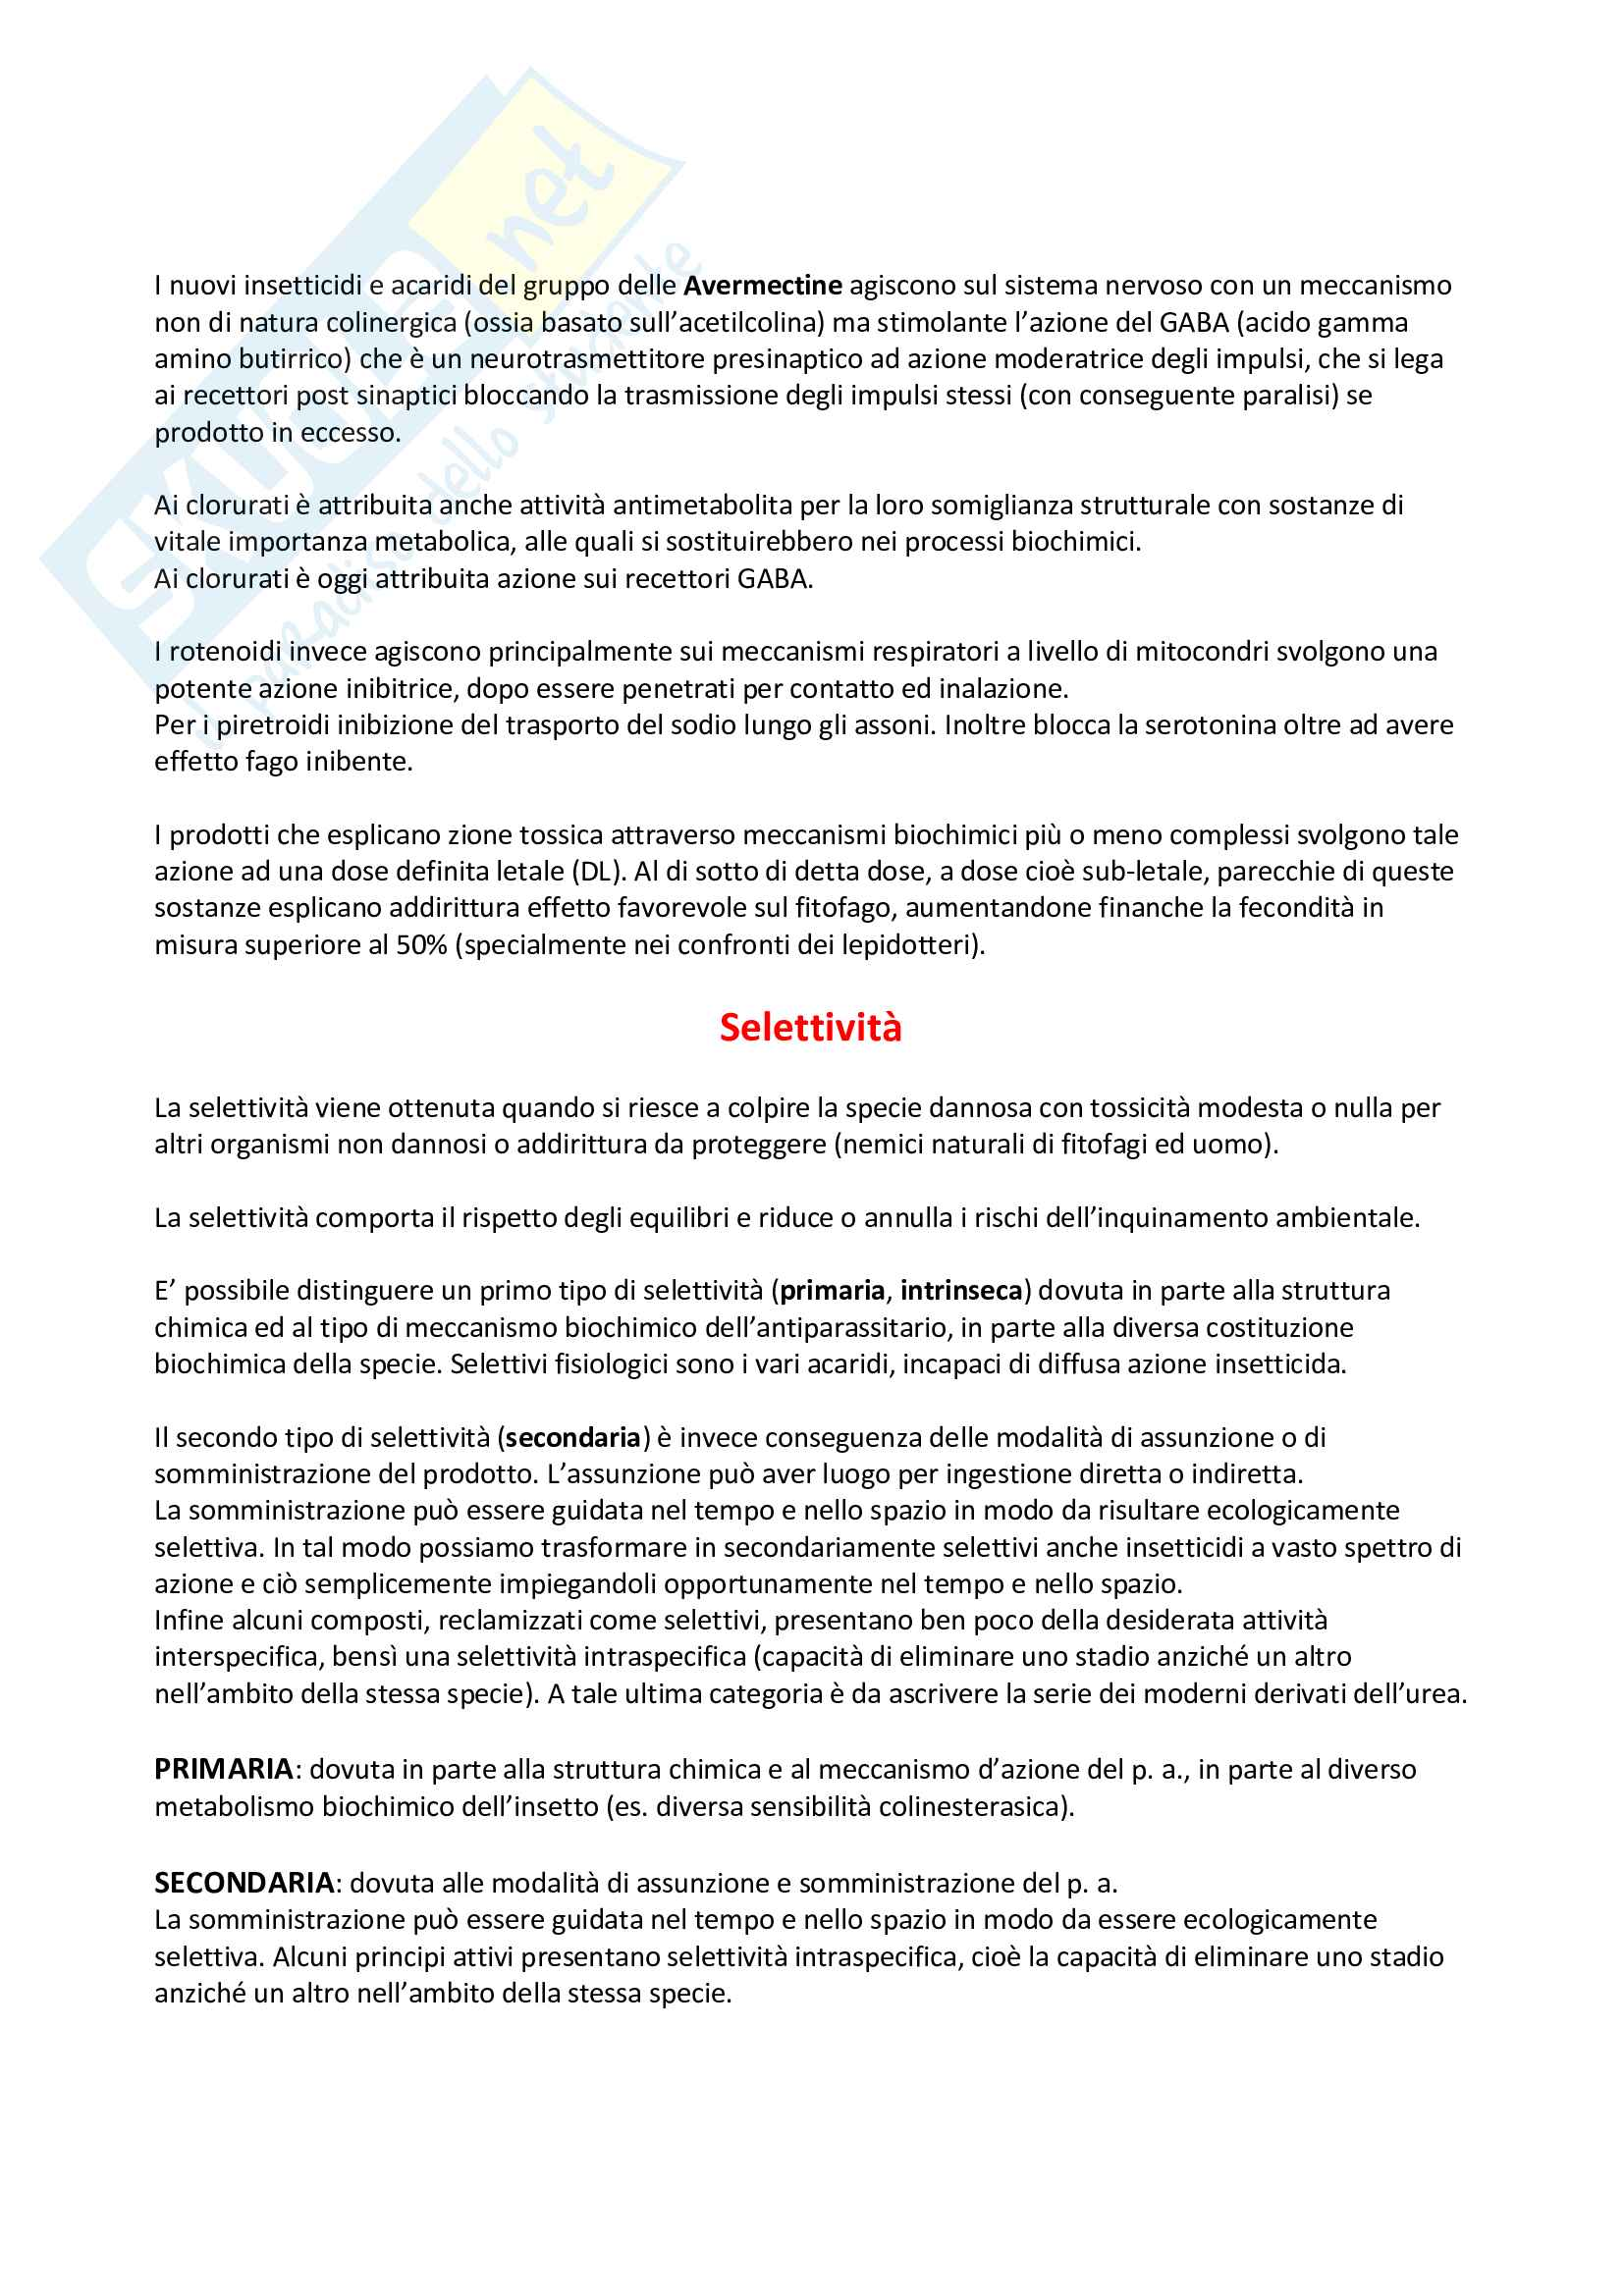 Entomologia - Insetticidi Pag. 11